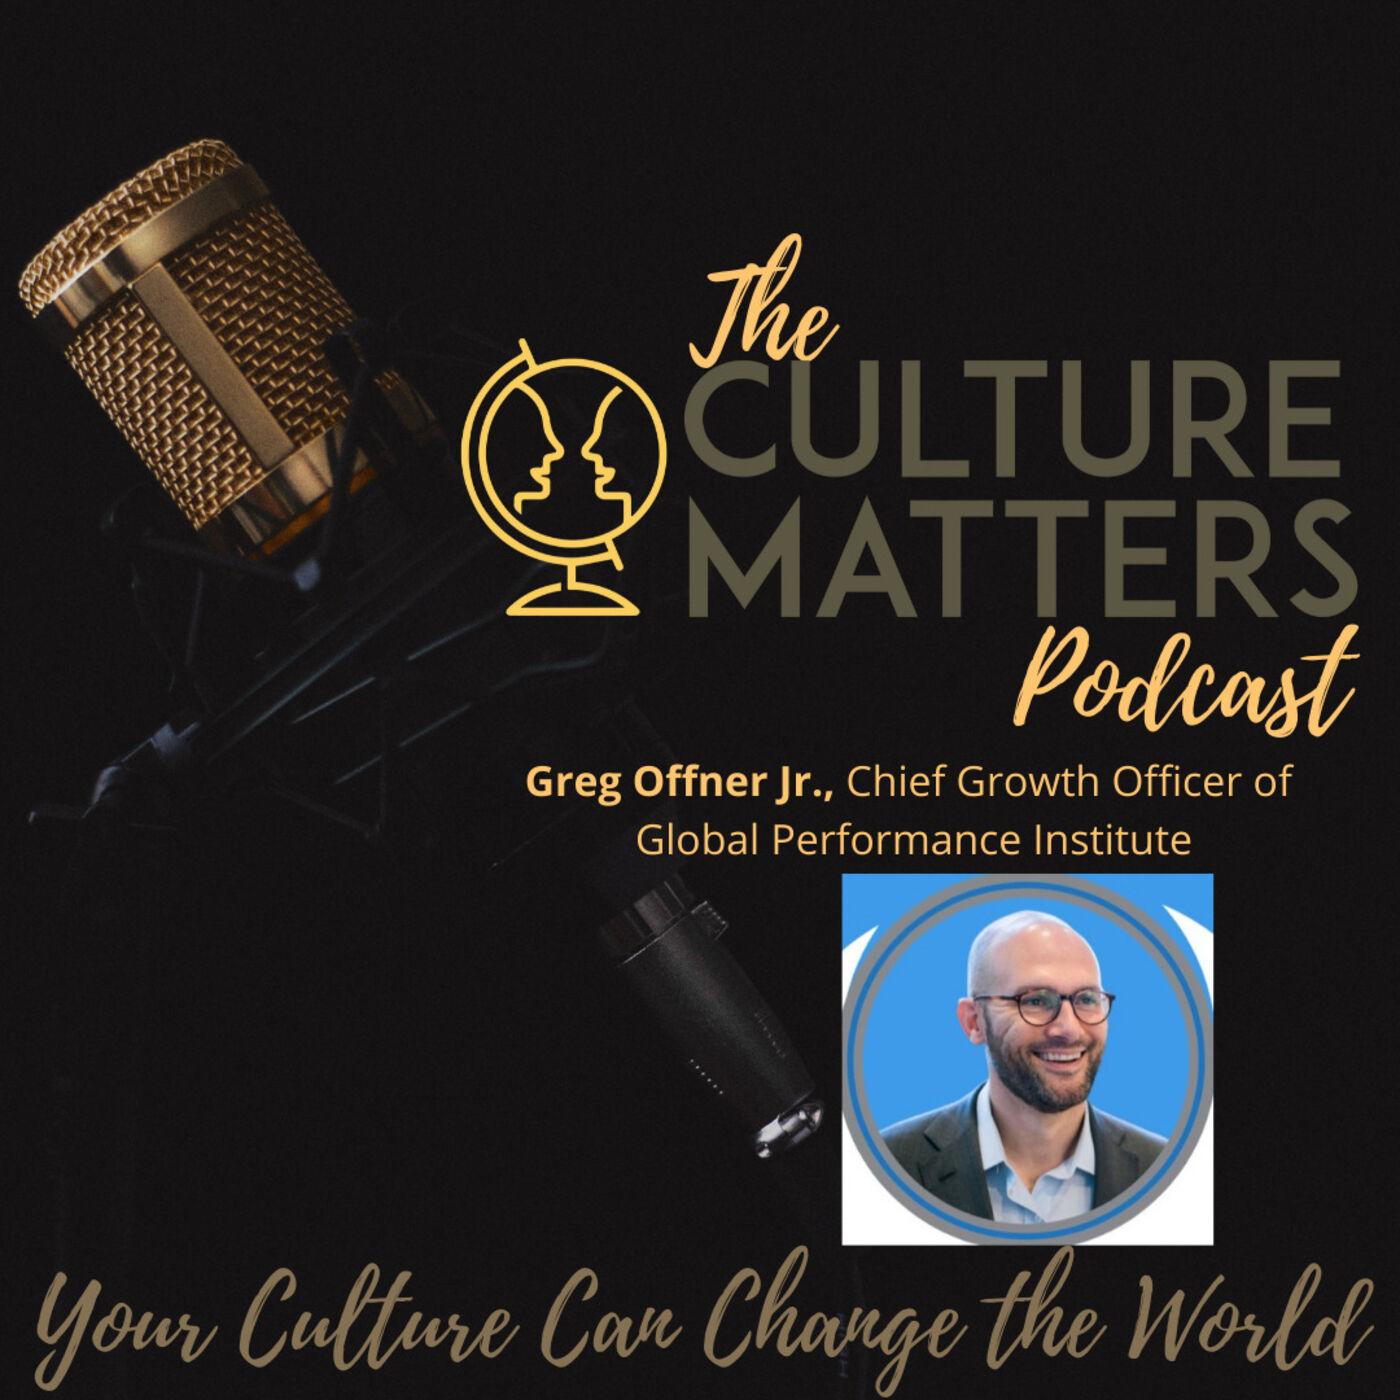 Season 7, Episode 74: Guest: Greg Offner Jr.: Disruption is a Change That Lasts